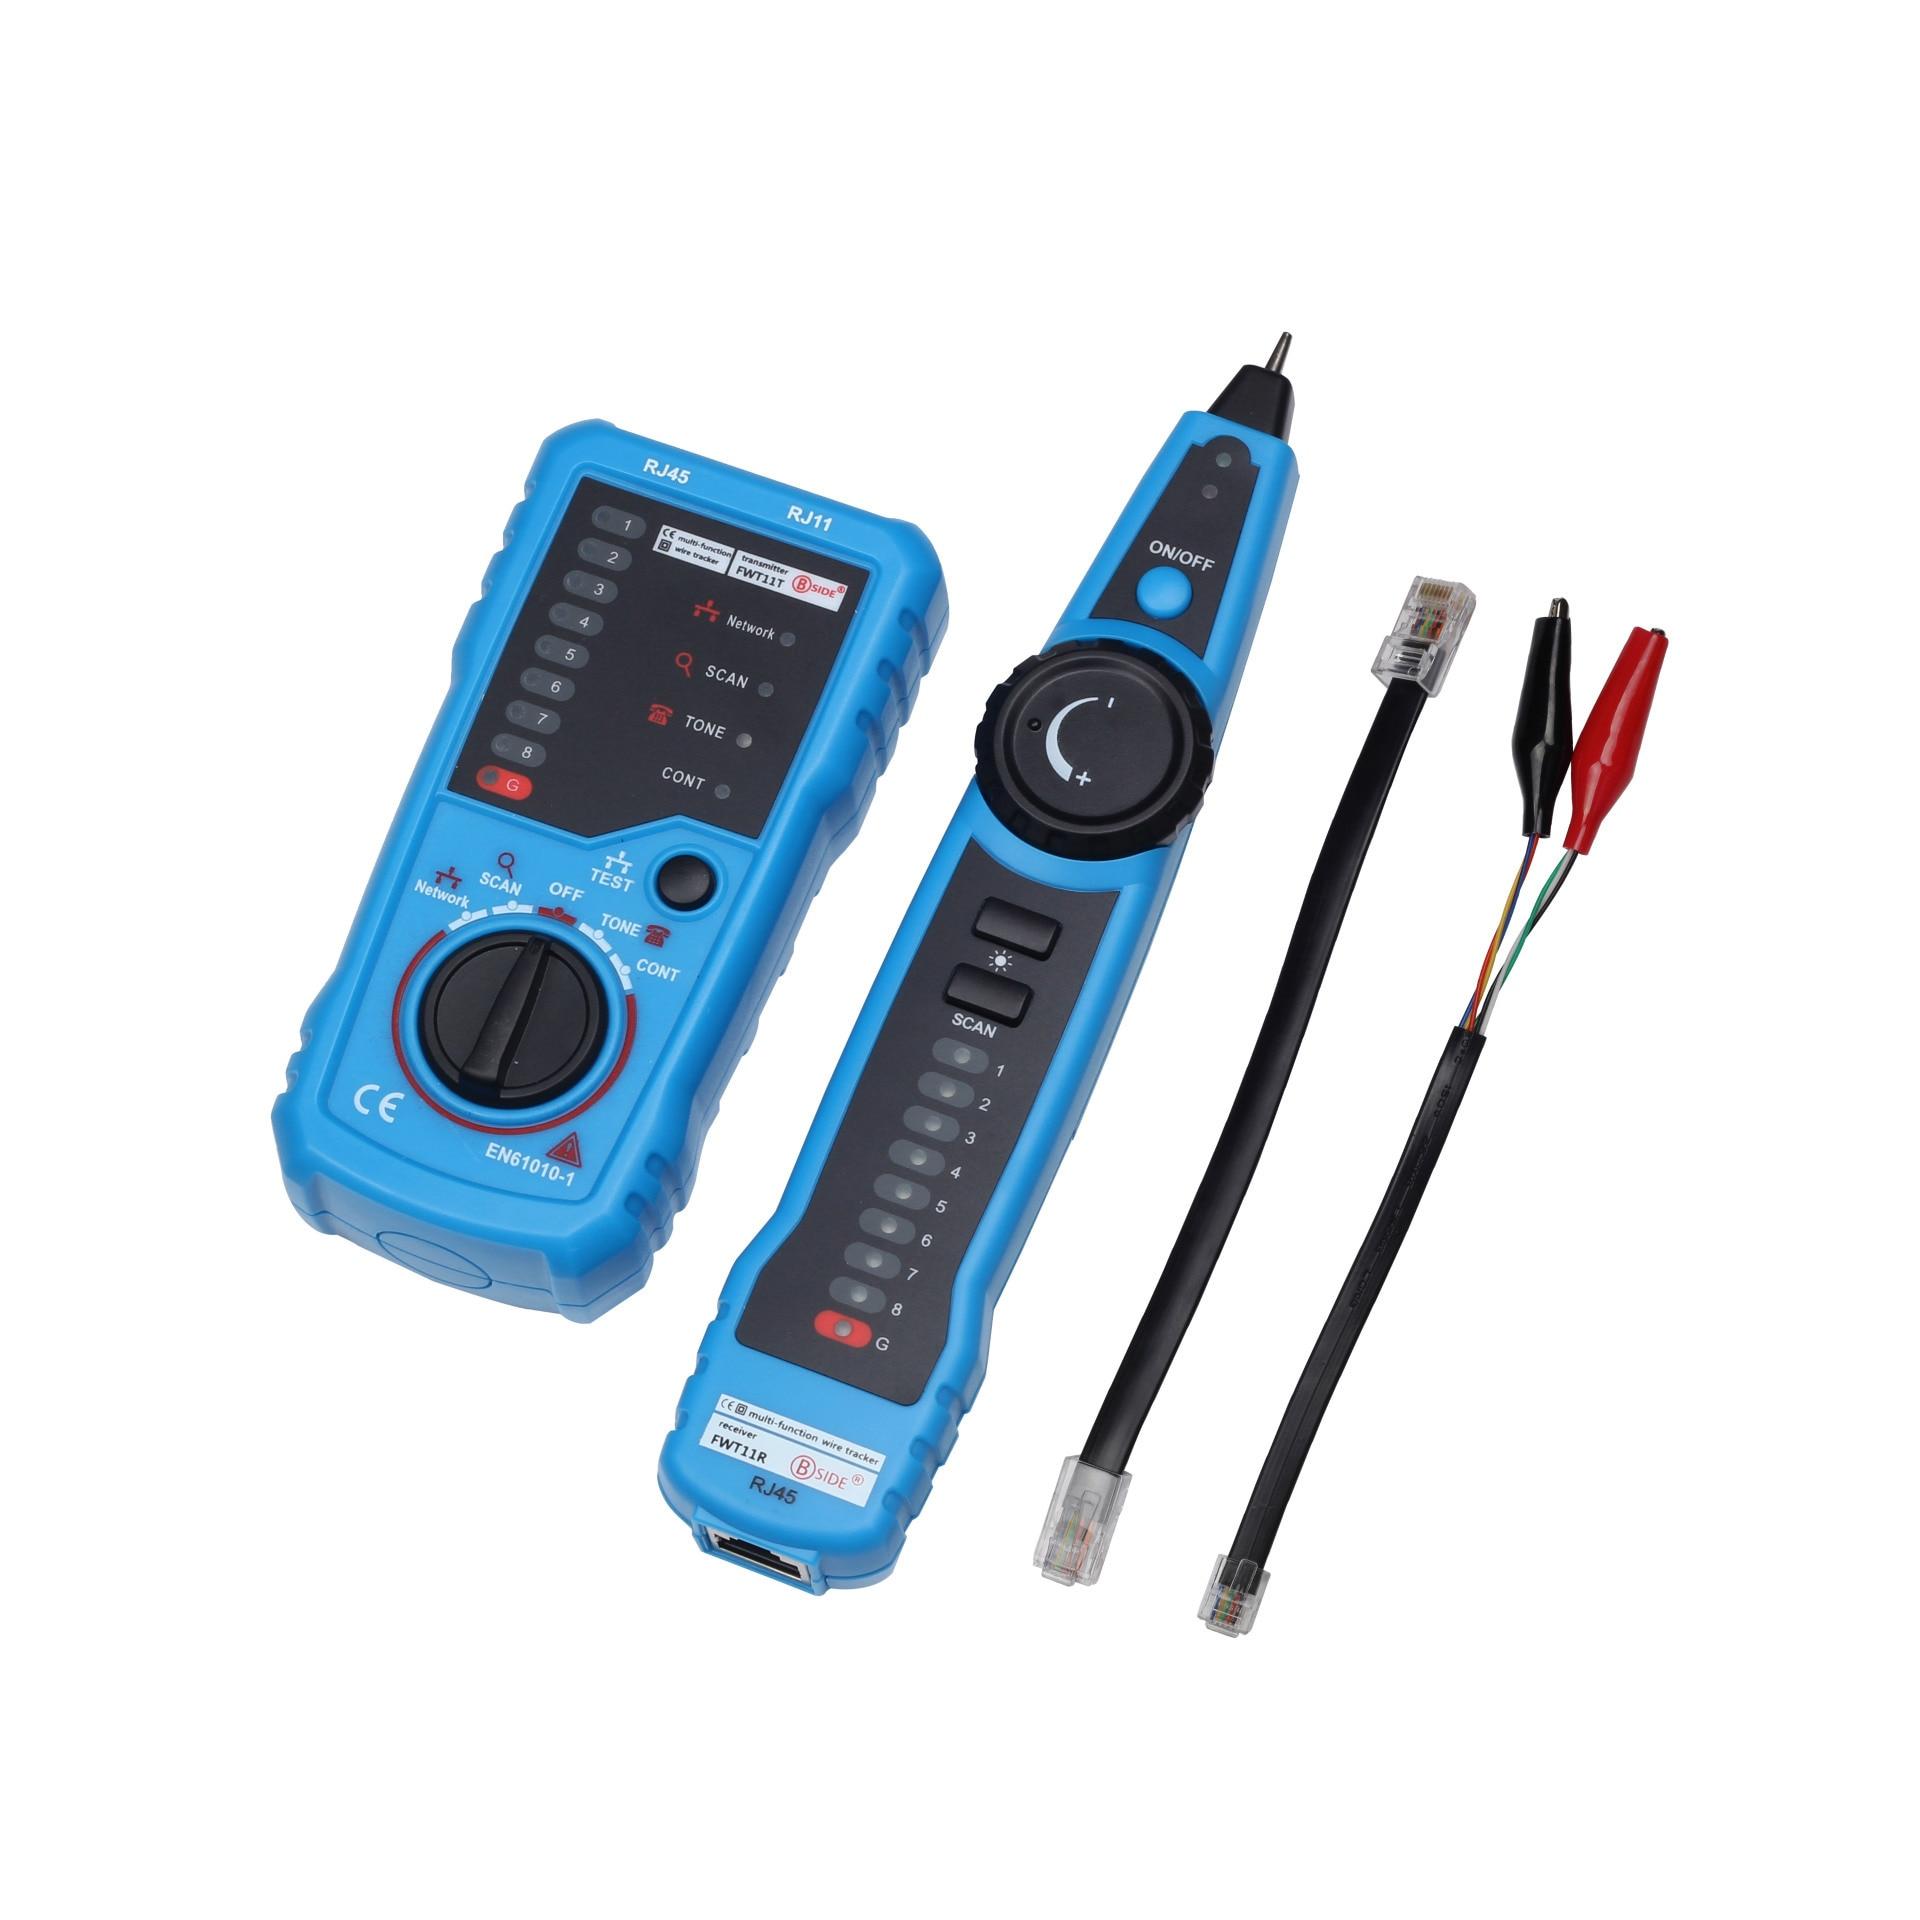 Cabo de rede lan tester cabo cat5 cat6 rj11 rj45 detector fio telefone tracer cabo rastreador toner ethernet linha finder